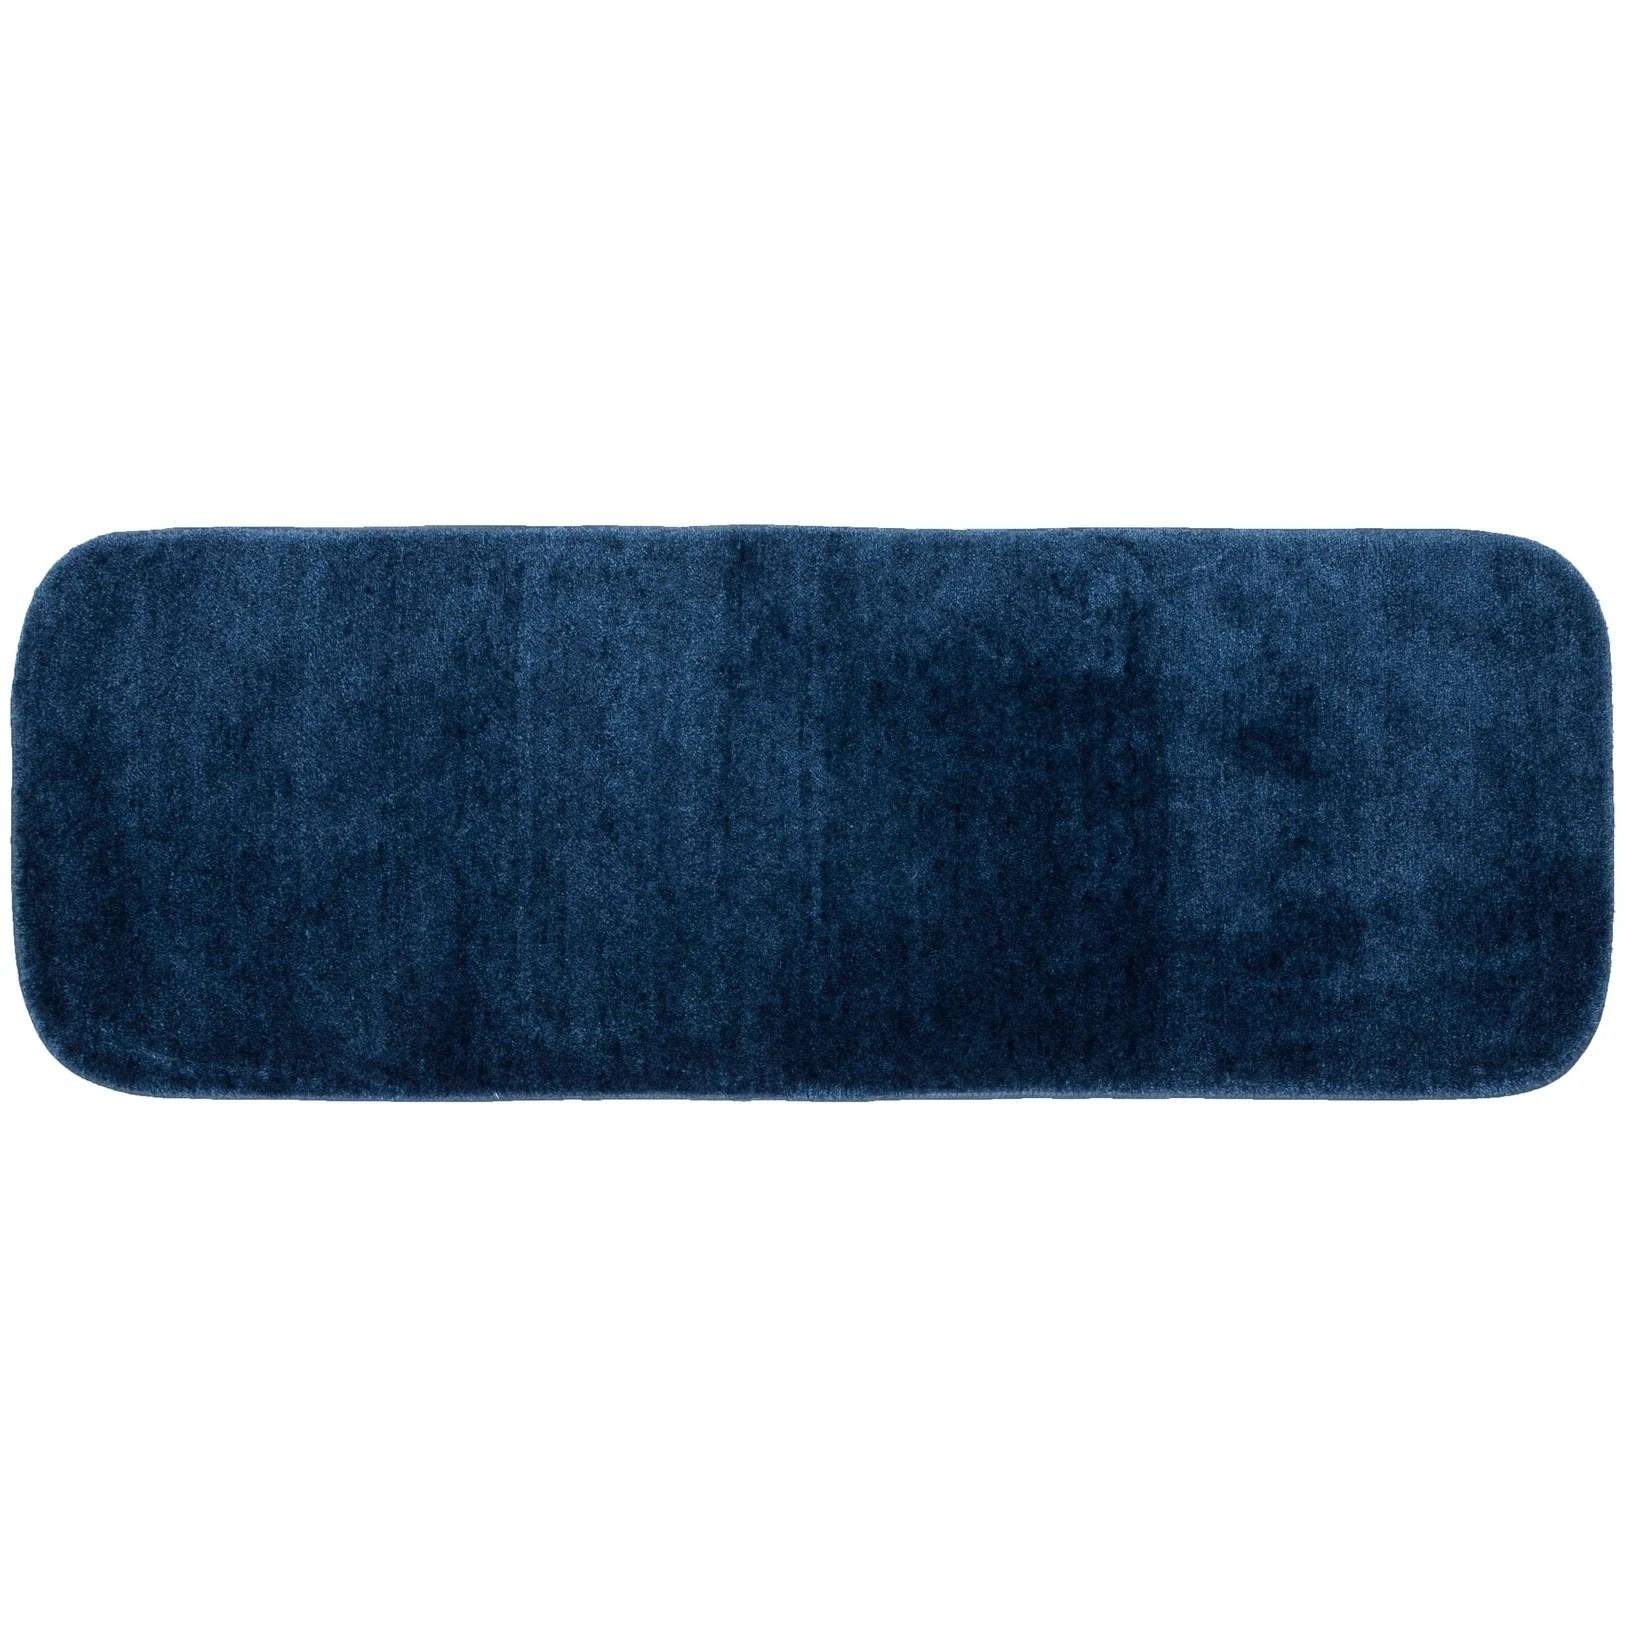 Traditional Plush Basin Blue Washable Nylon Bathroom Rug Runner Non Slip Appliques Mats Home Garden